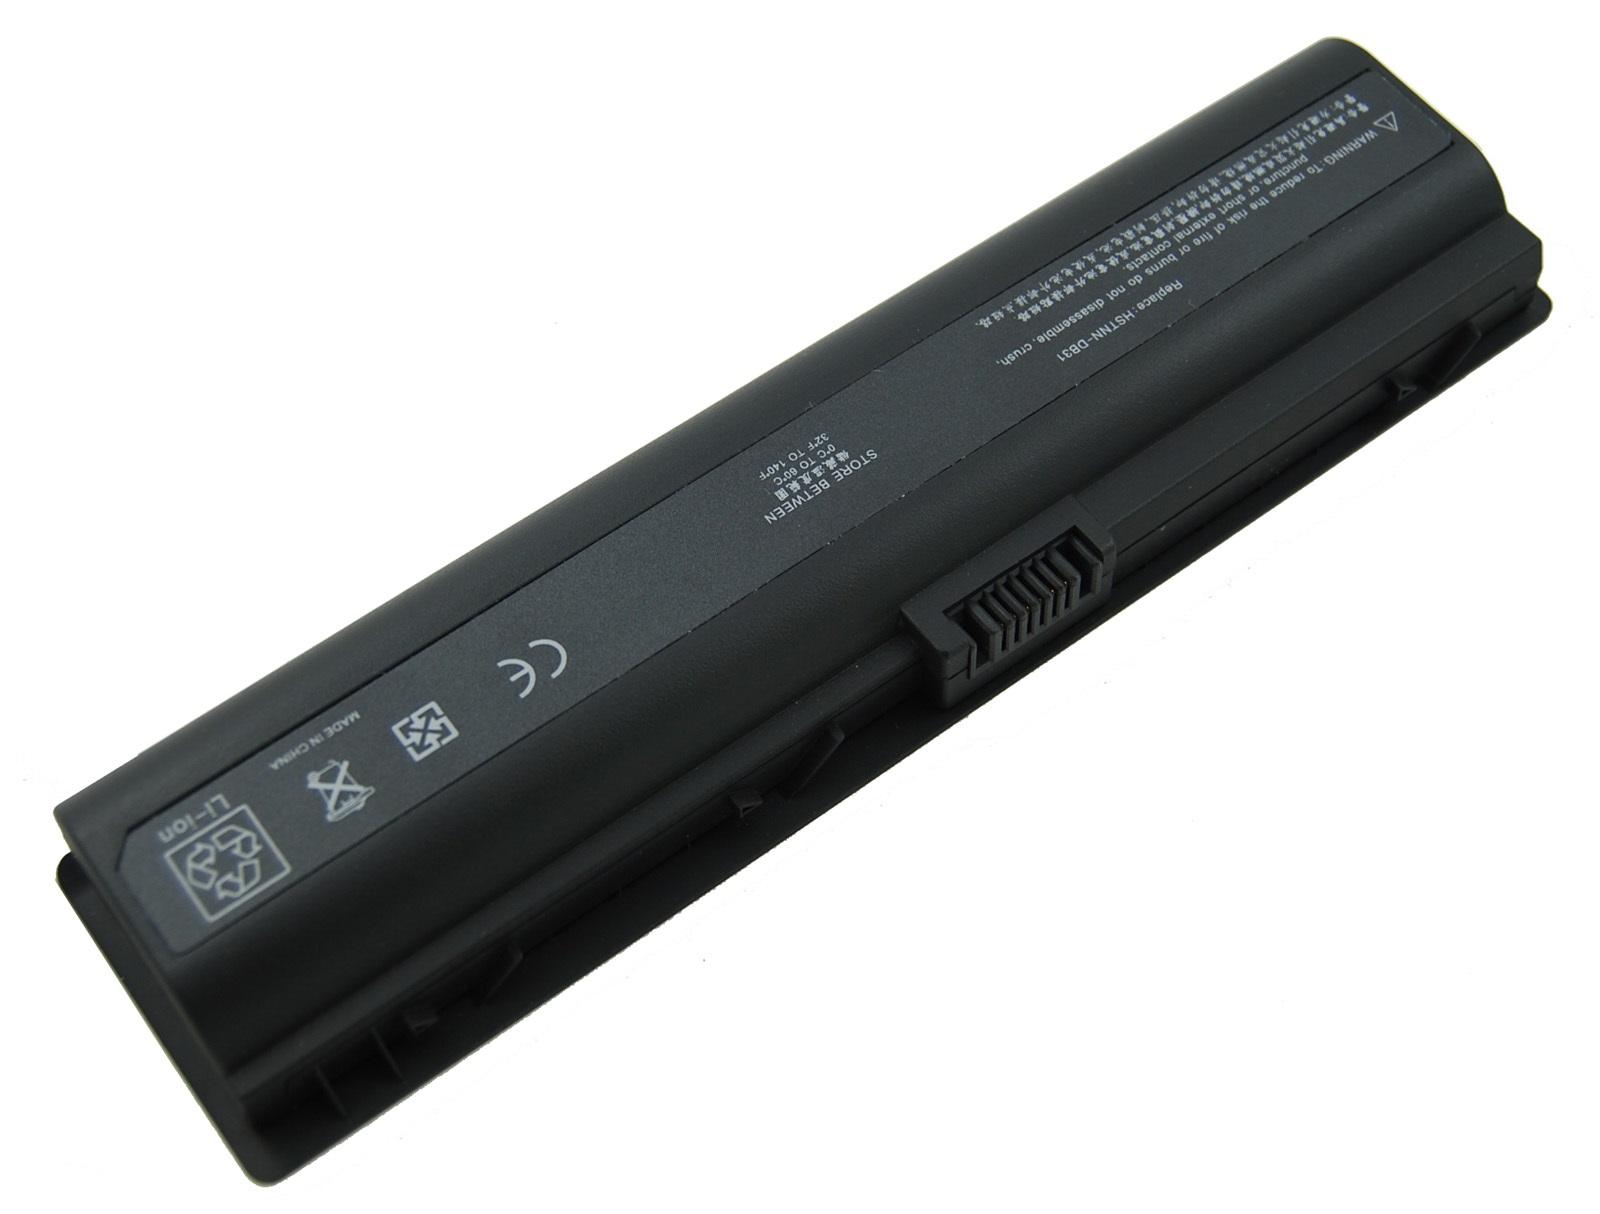 BATTERY FOR NOTEBOOK HP DV6000 DV2000 HSTNN-DB42 M&M COPY ,Laptop Battery